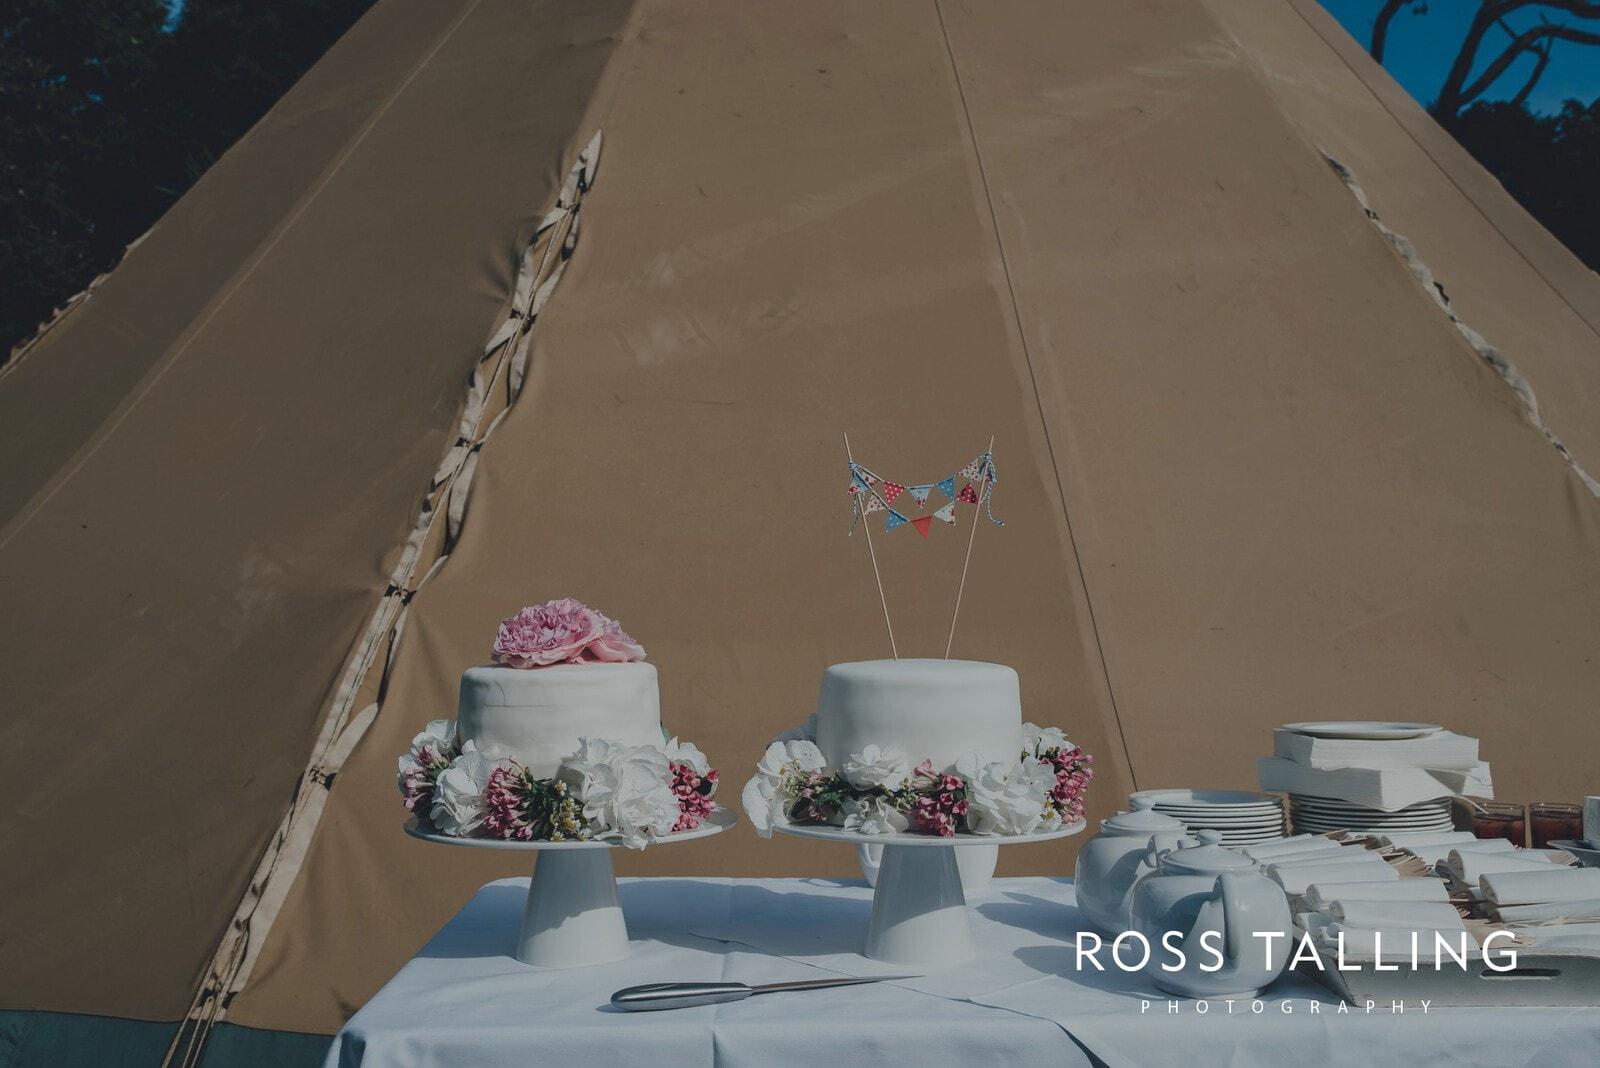 laura-matts-rosevine-hotel-wedding-photography-cornwall_0115